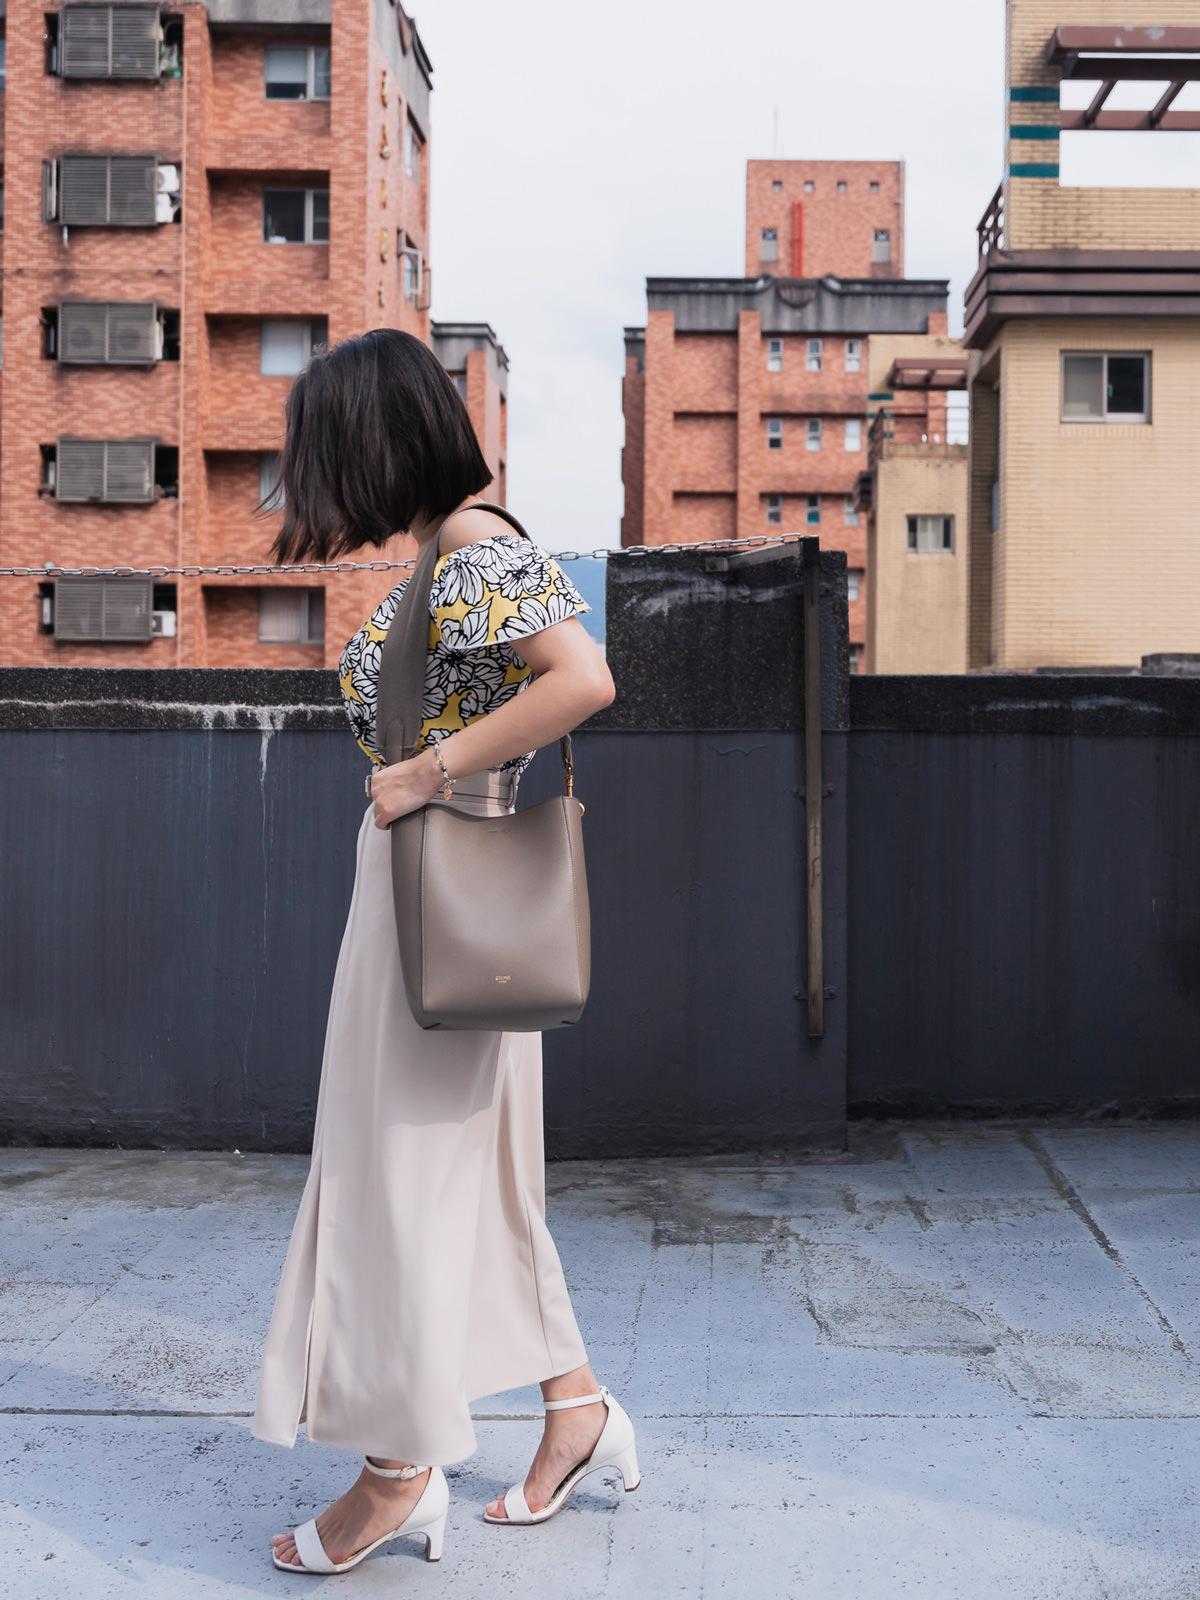 Celine Small Sangle Bag + ASOS黃色花朵露肩上衣 + Yourz 奶油色一片裙,一個女主管週五要下墾丁度假的Style😆